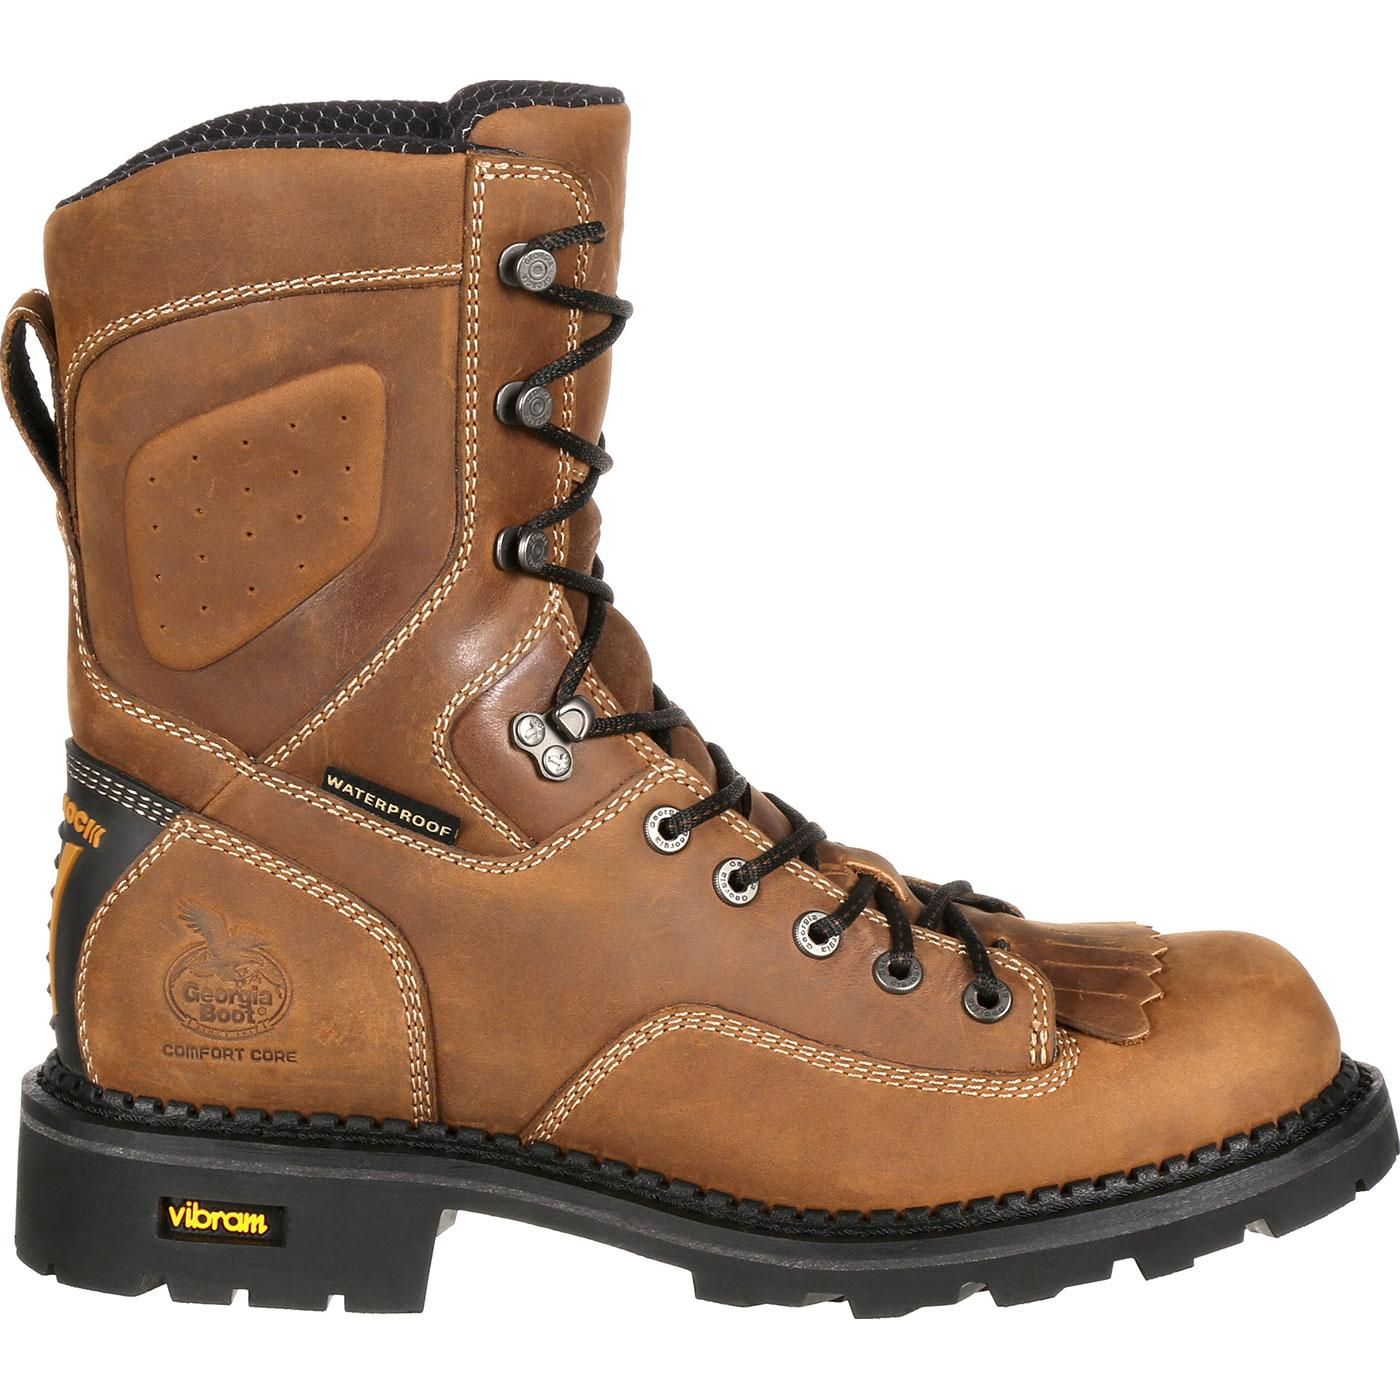 b0b87dc76d2 Georgia Boot Comfort Core Composite Toe Waterproof Logger Work Boot